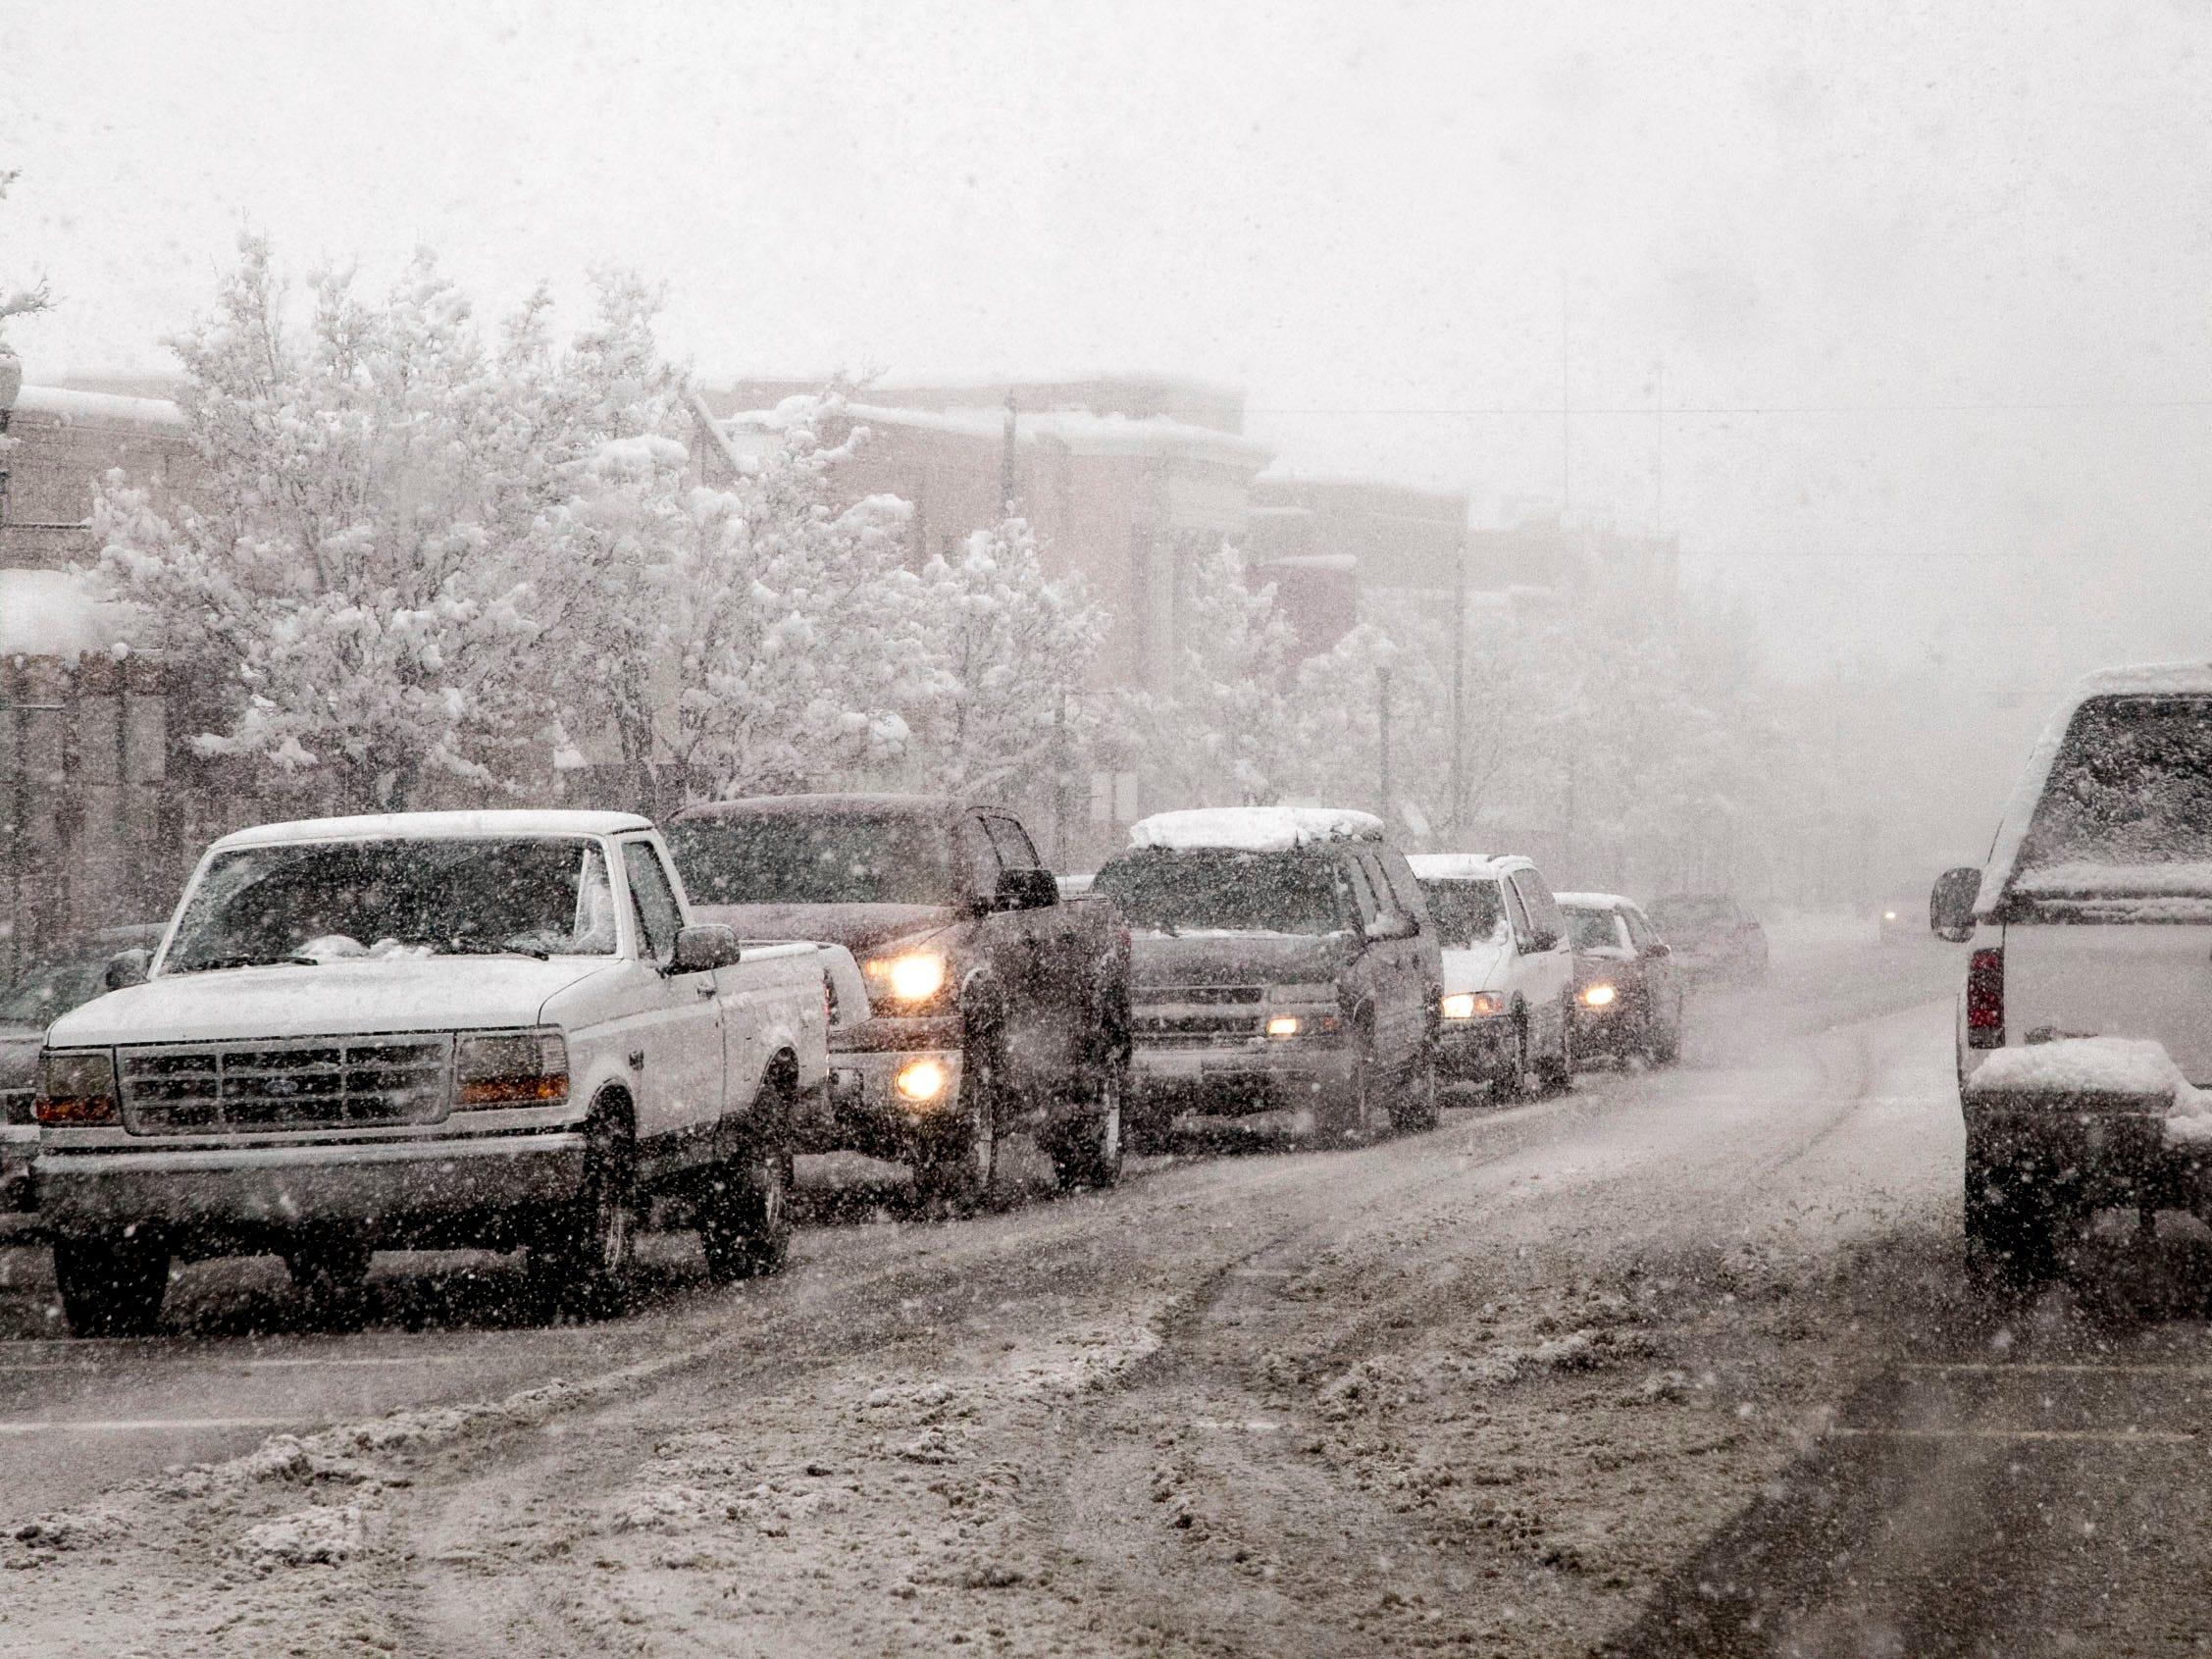 No white Christmas: Cedar nears 40-year record for latest snowfall